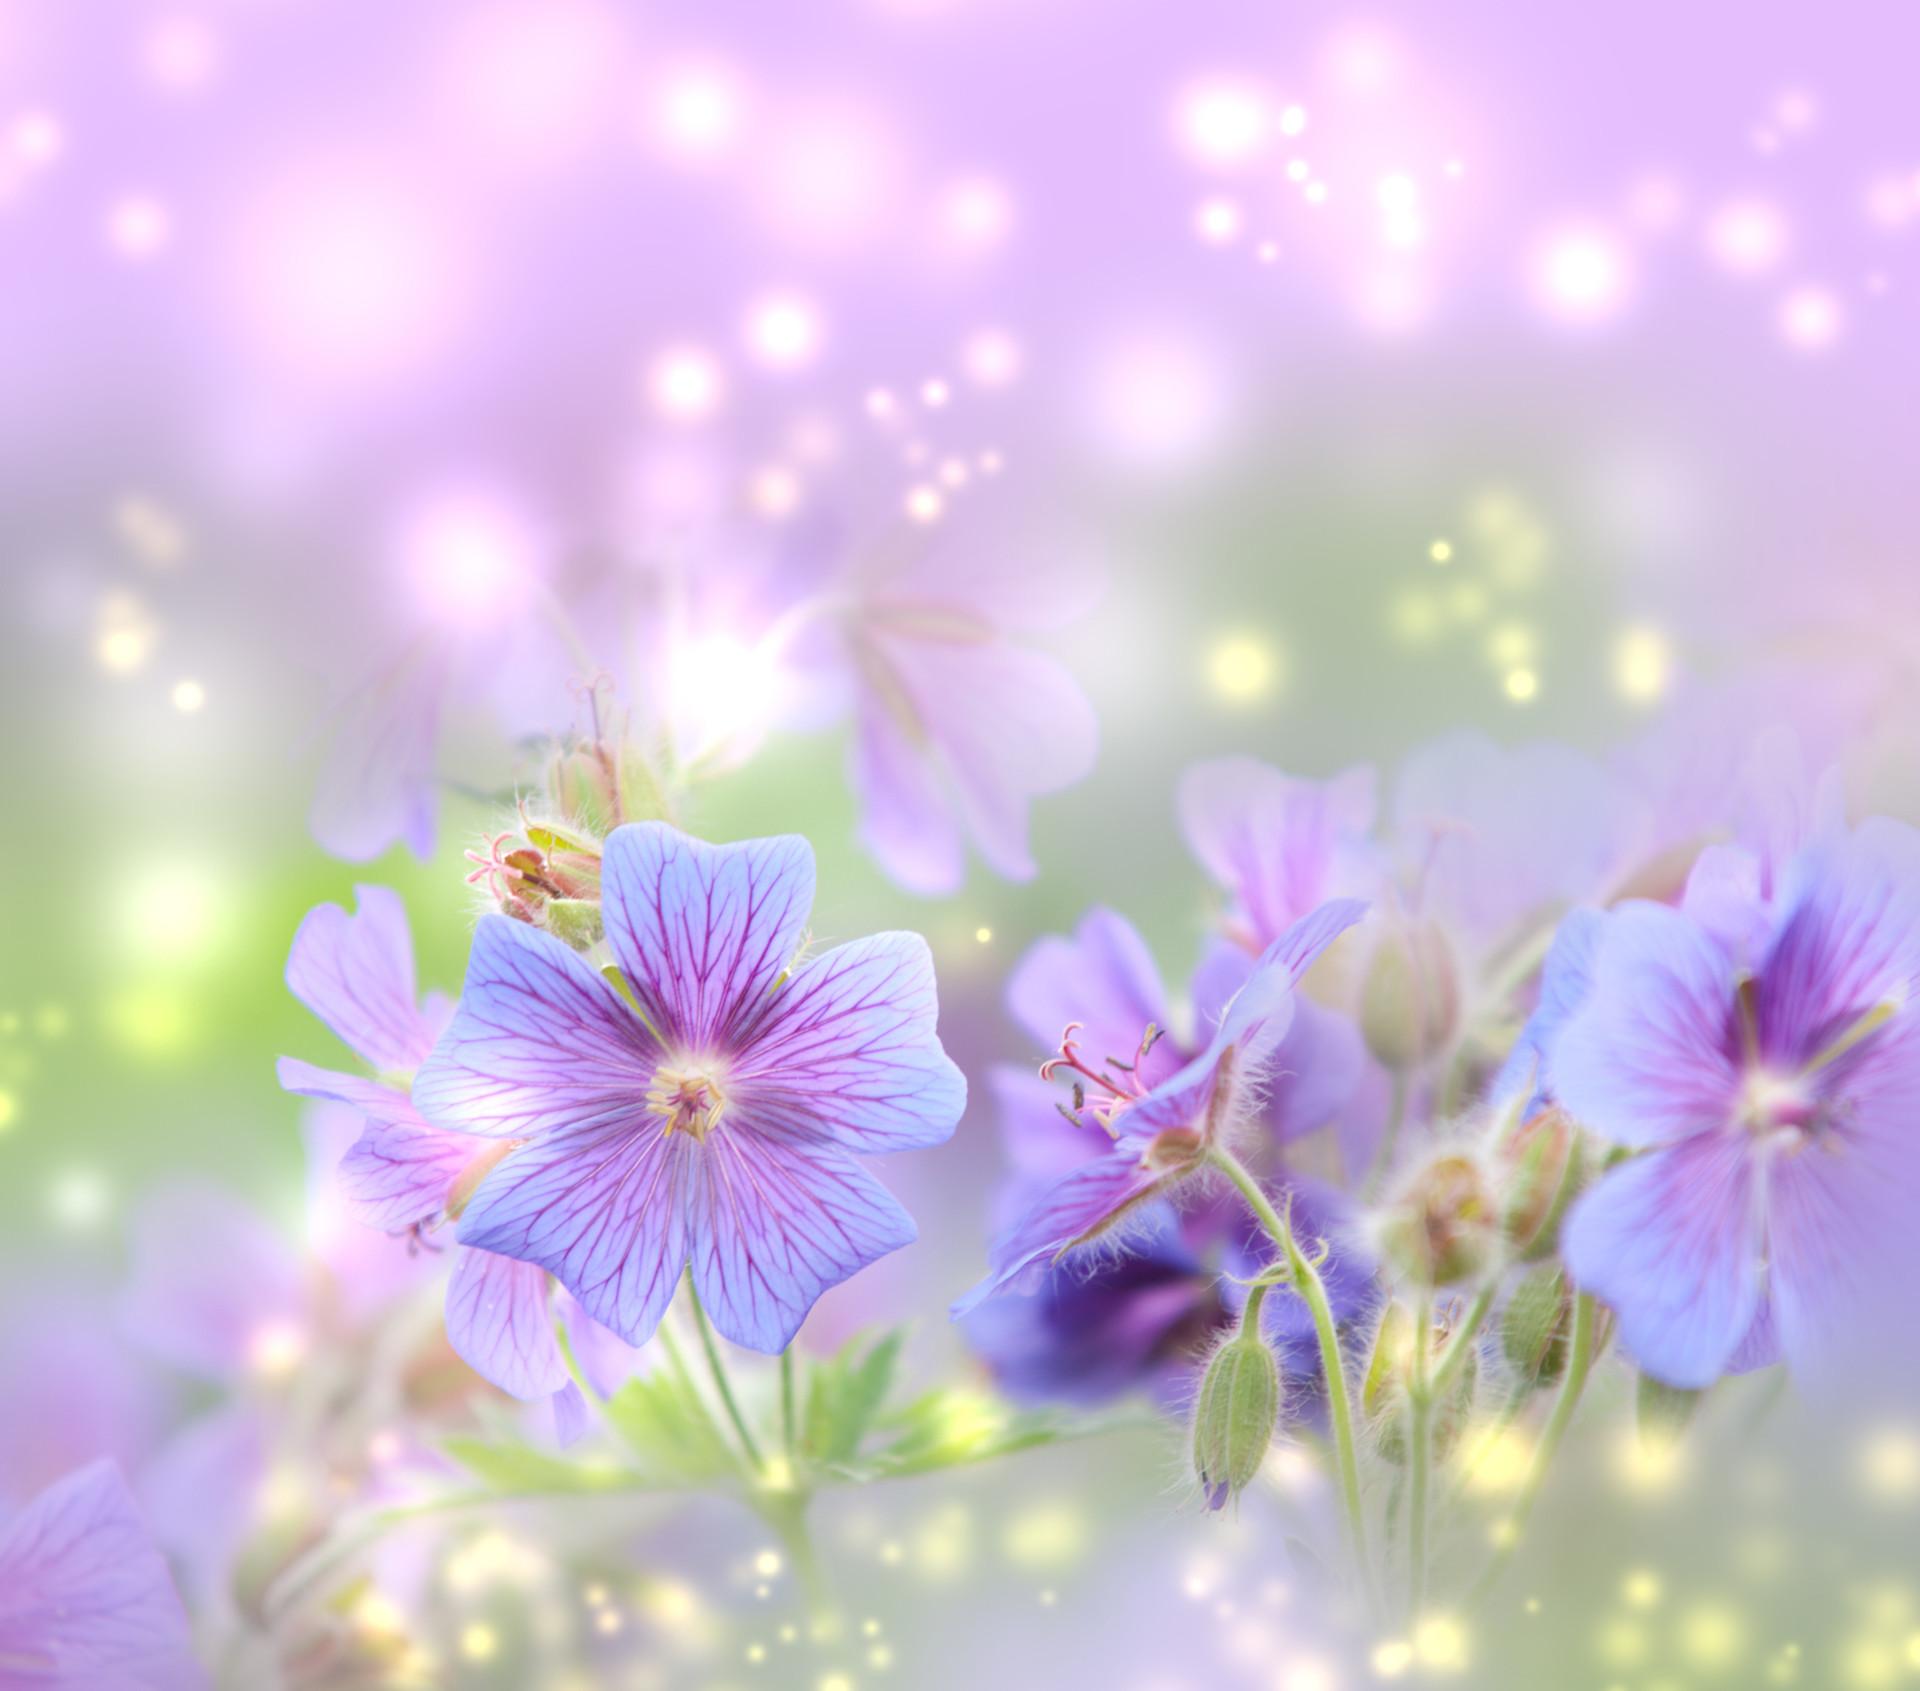 Spring desktop wallpapers backgrounds 65 images 2560x1600 spring flowers wallpaper images wallpapers mightylinksfo